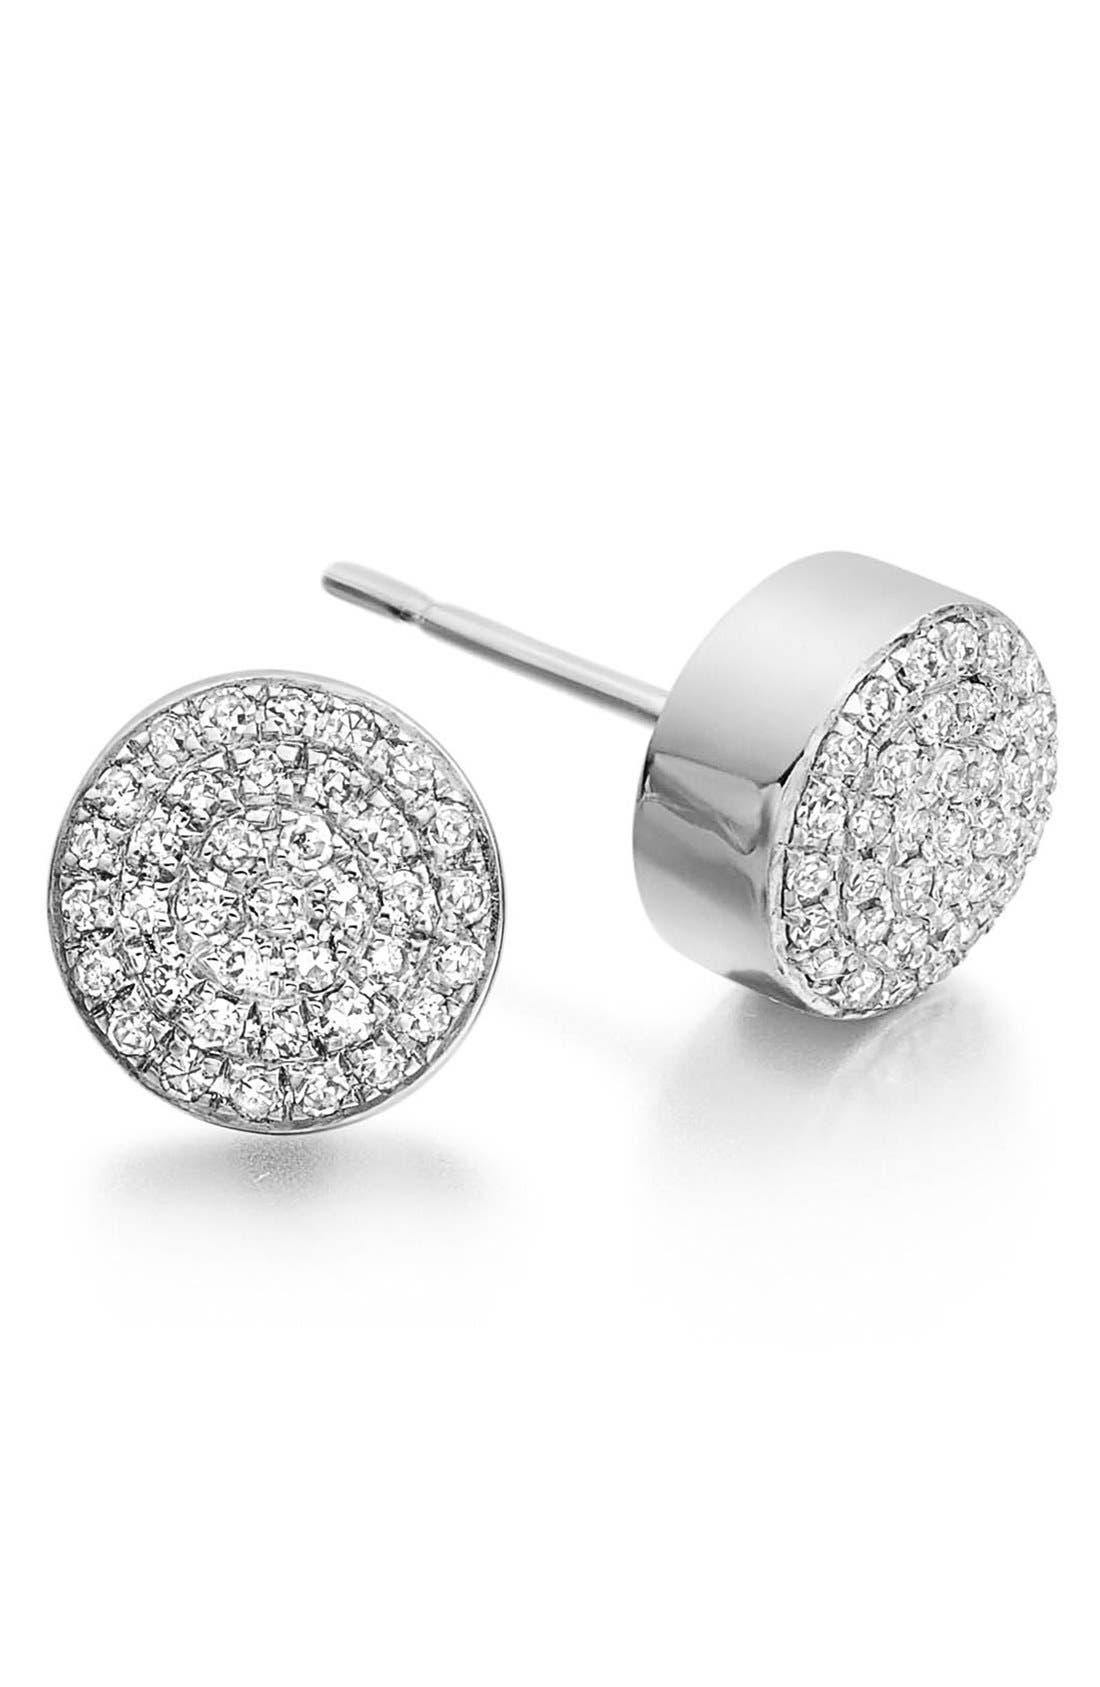 'Ava' Diamond Button Stud Earrings,                             Main thumbnail 1, color,                             SILVER